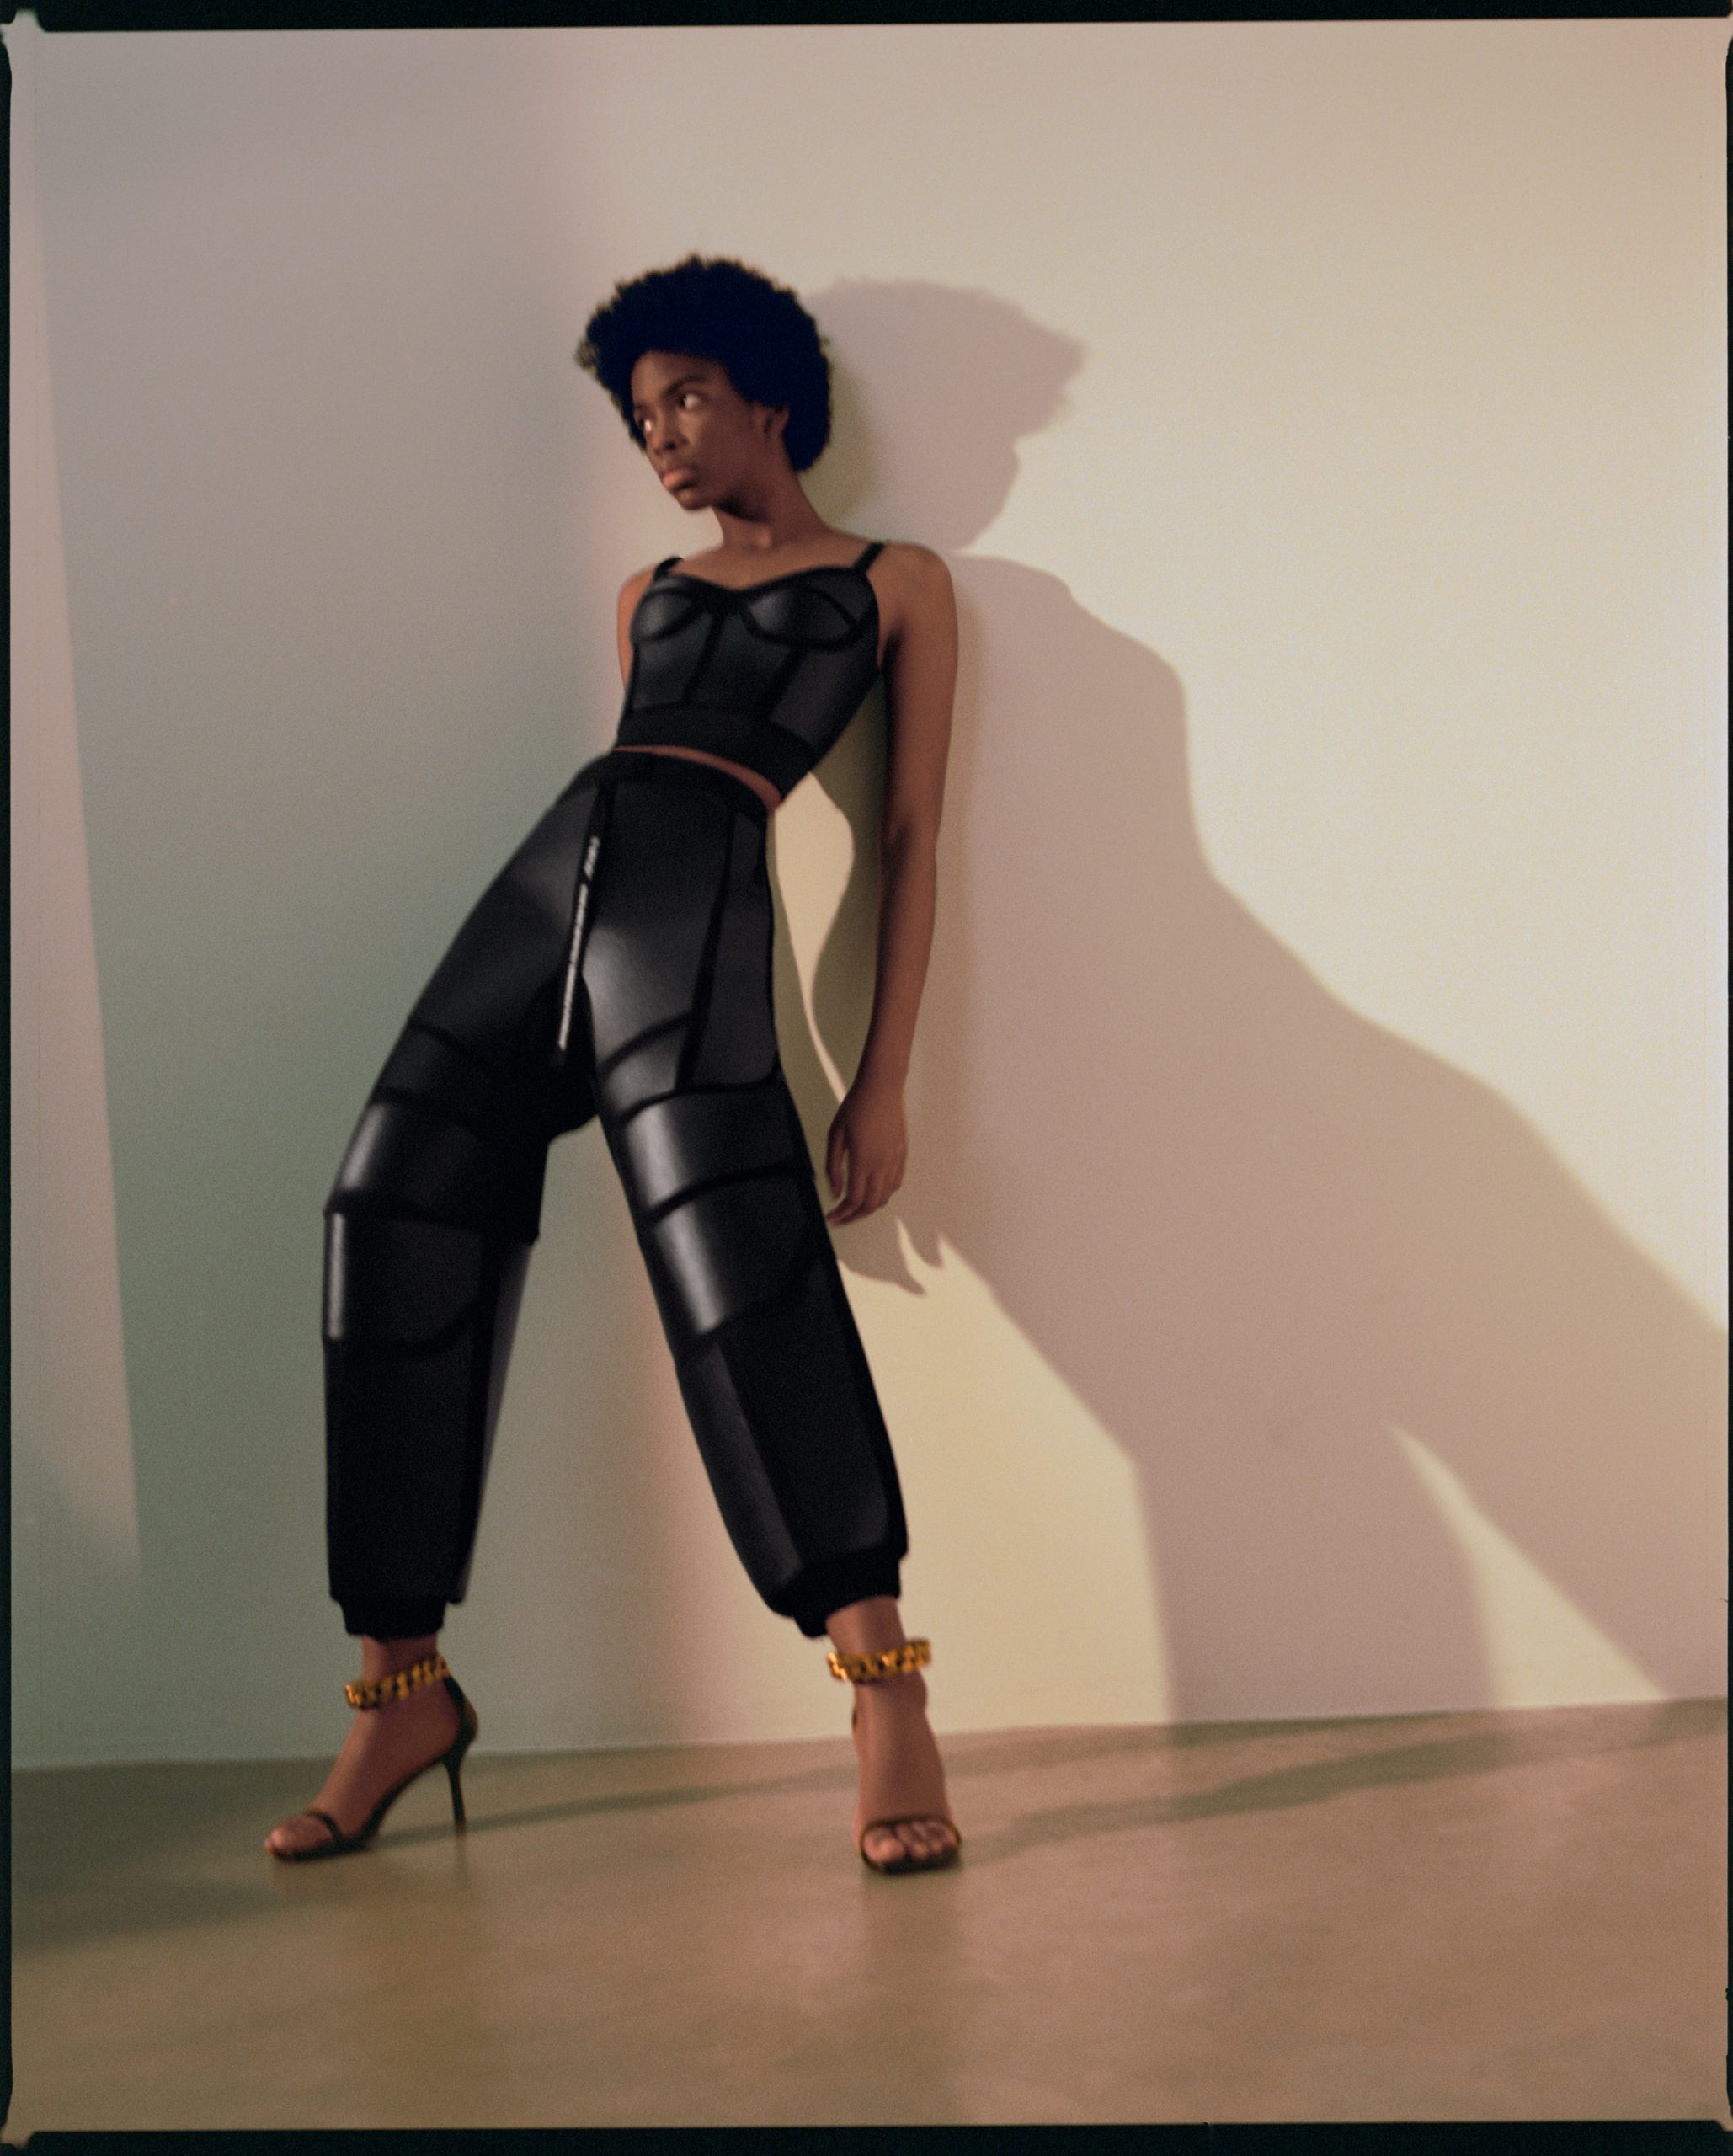 Full-body shot of model wearing mycelium leather clothing by Stella McCartney